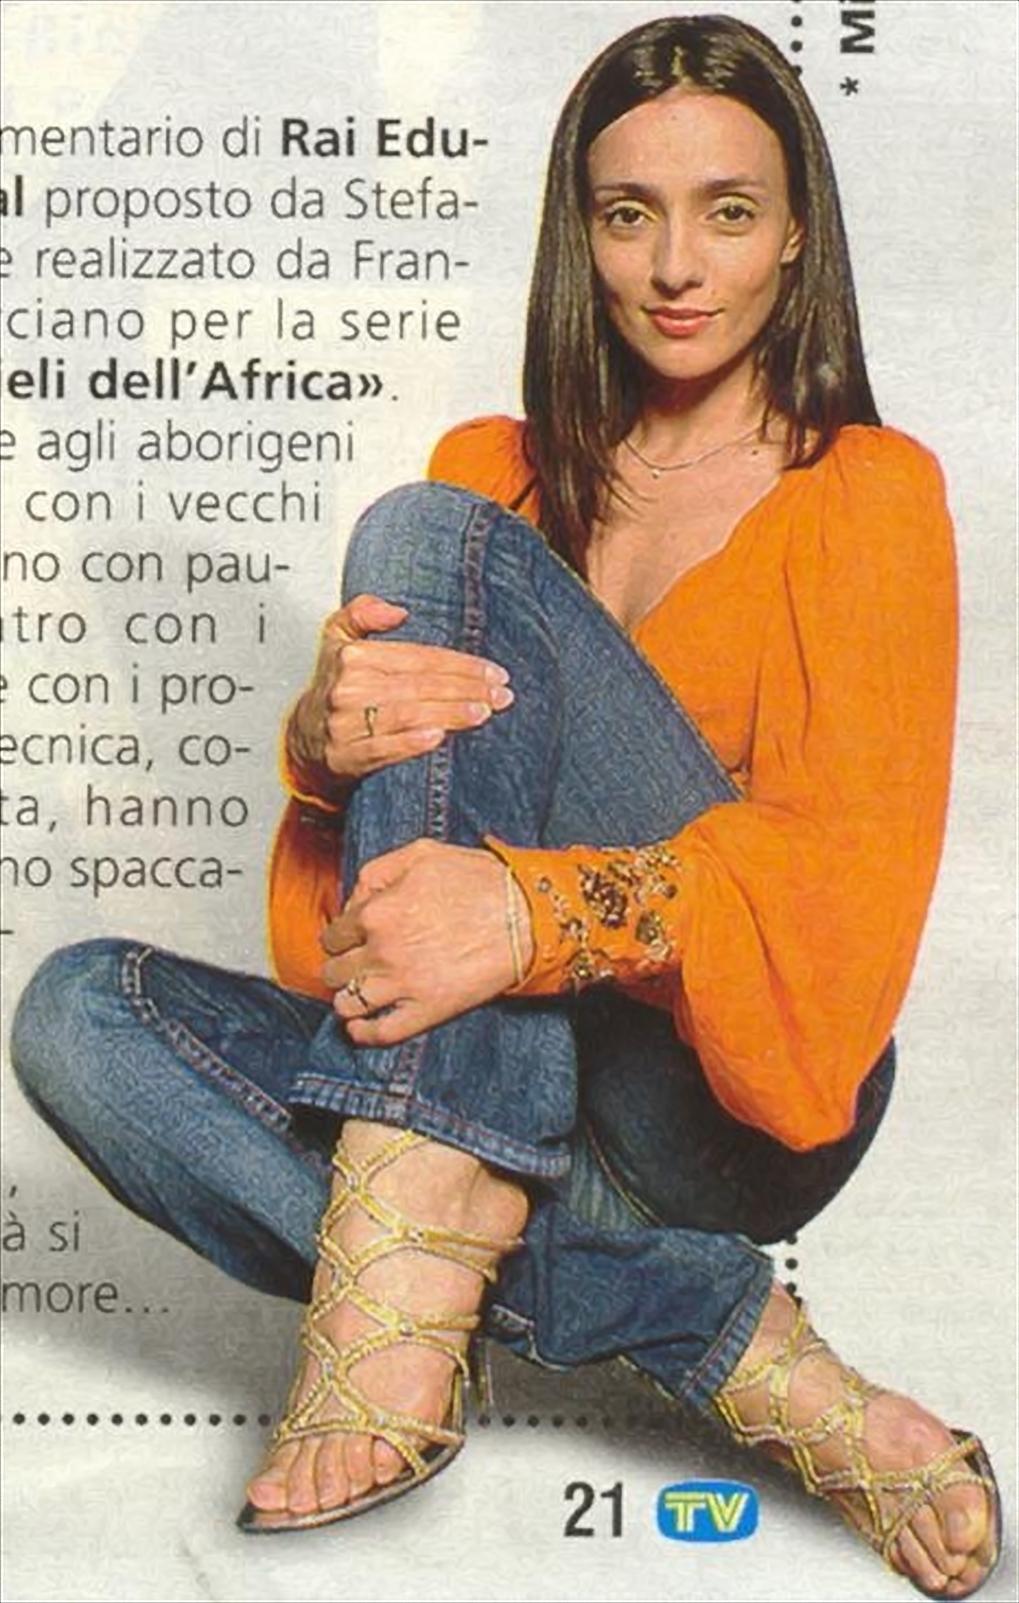 Watch Ambra Angiolini (born 1977) video